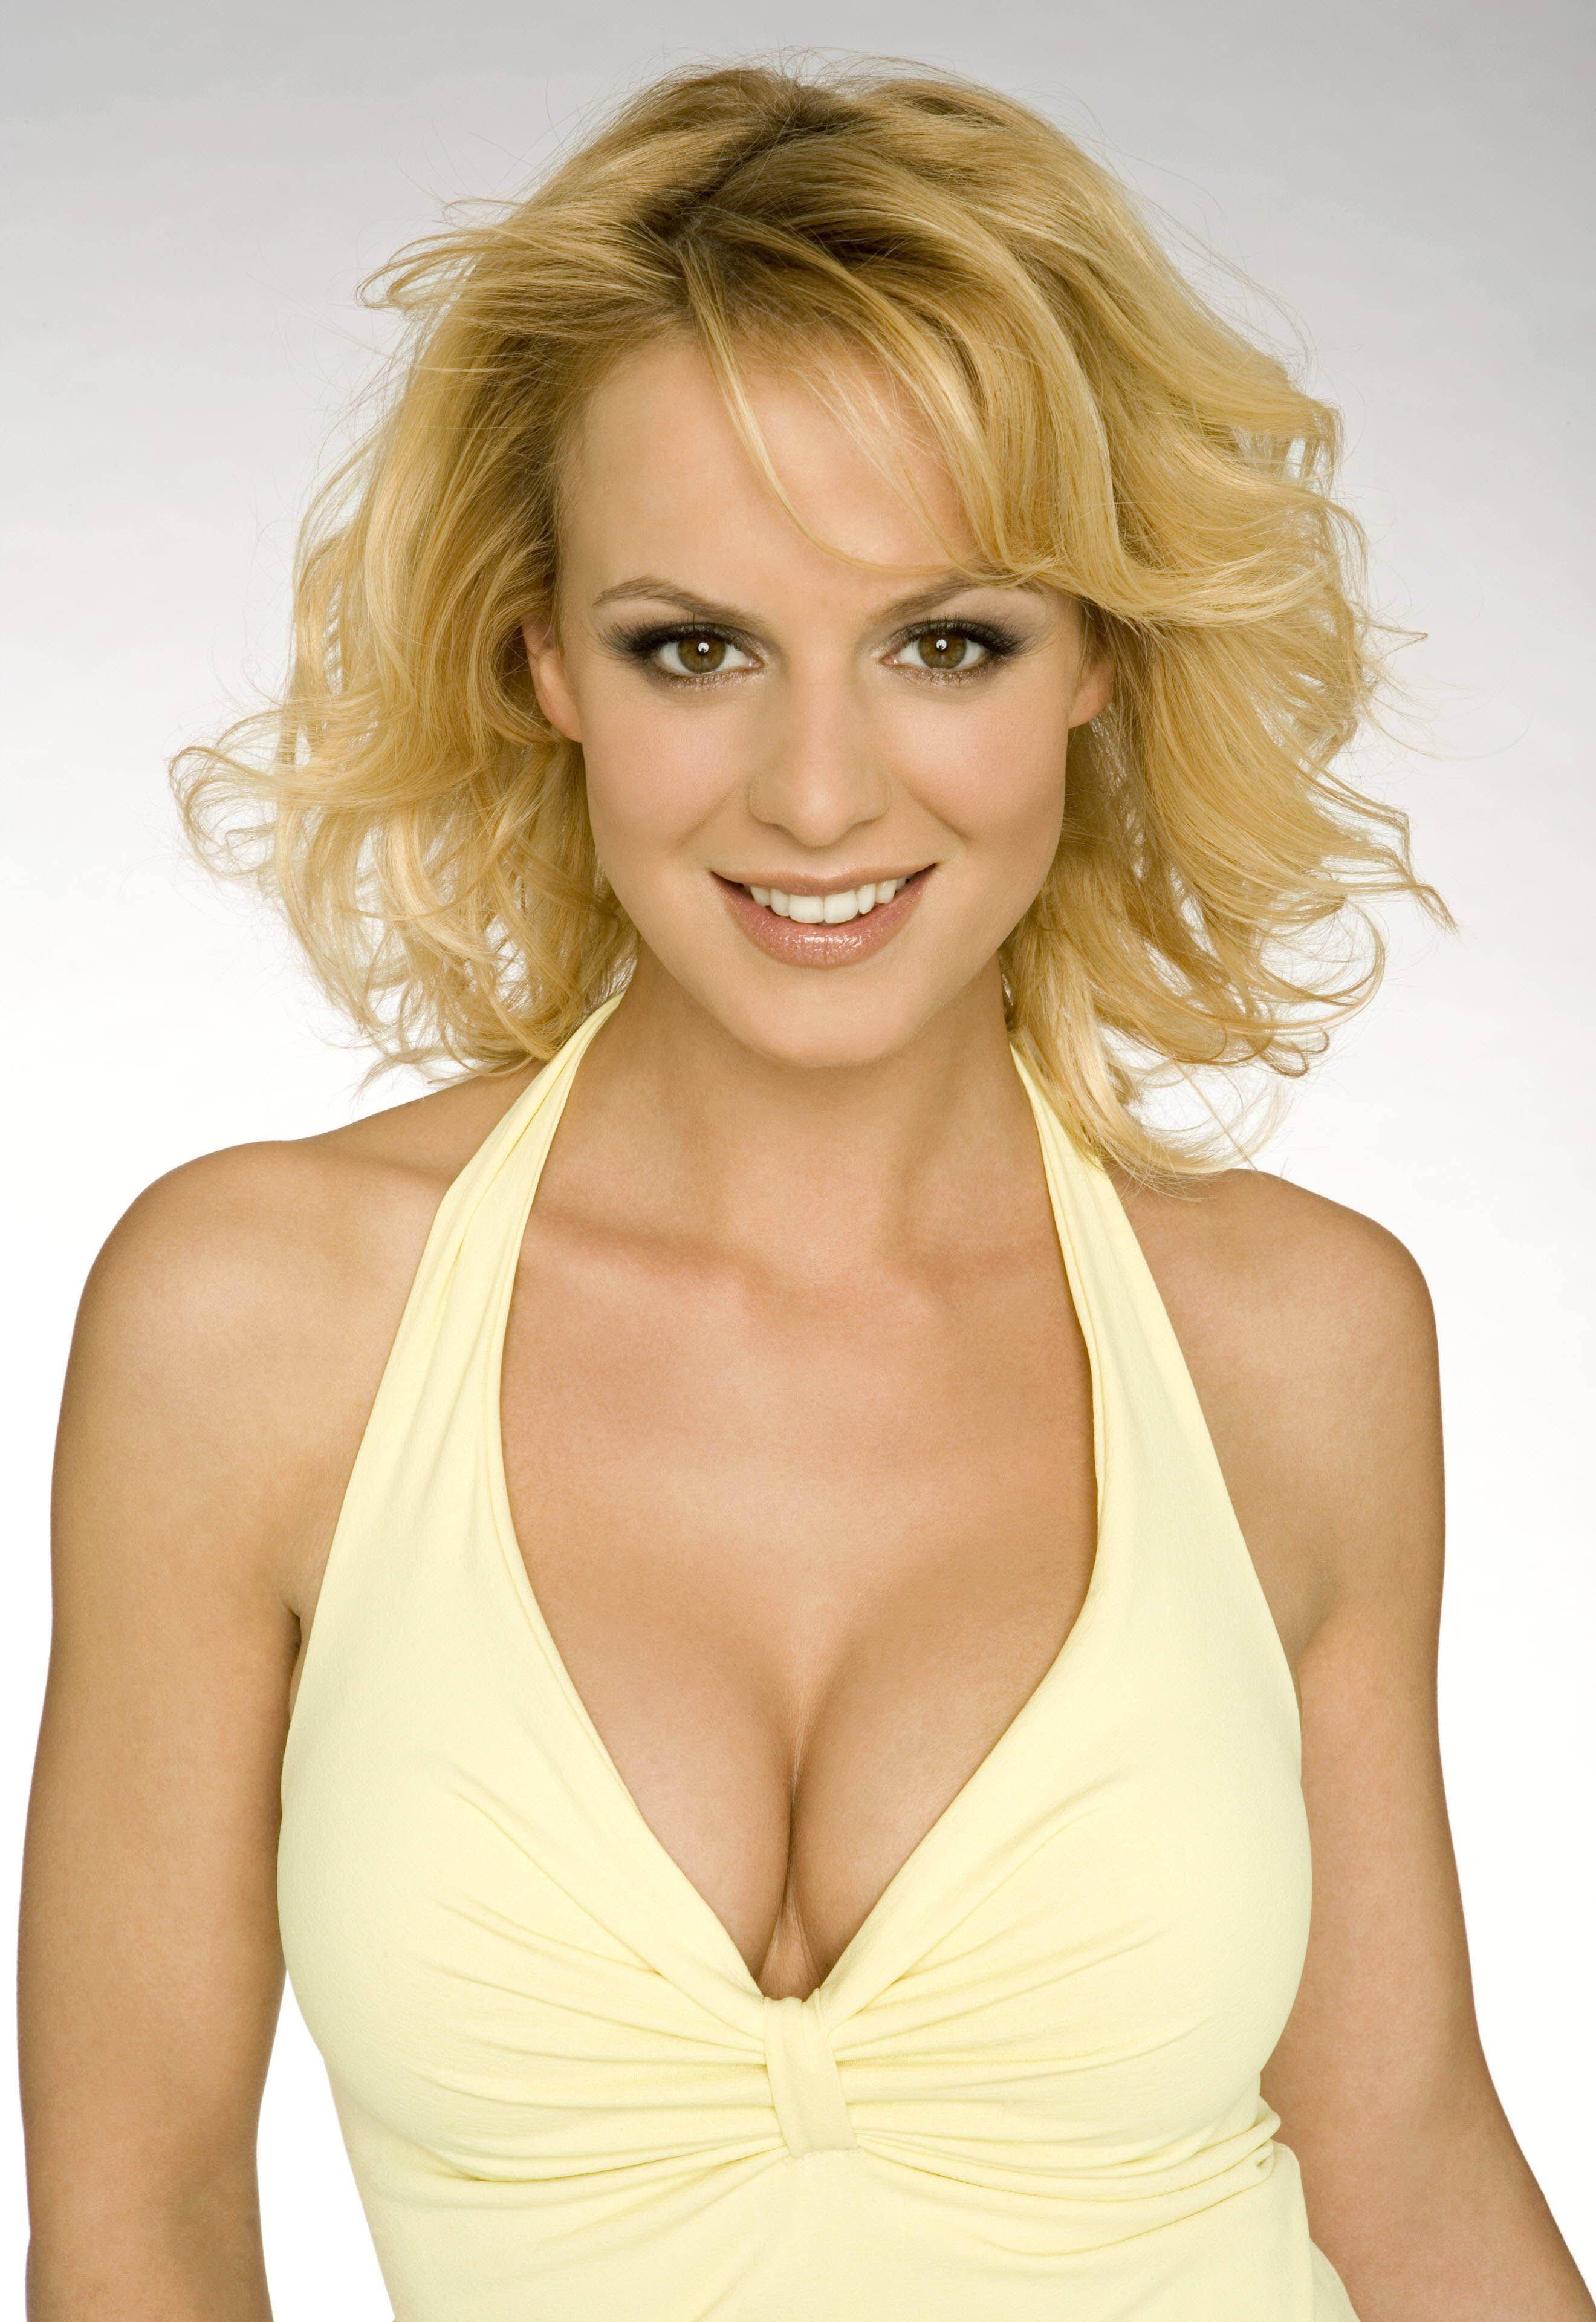 Anja Nejarri Nude | Hot Girl HD Wallpaper